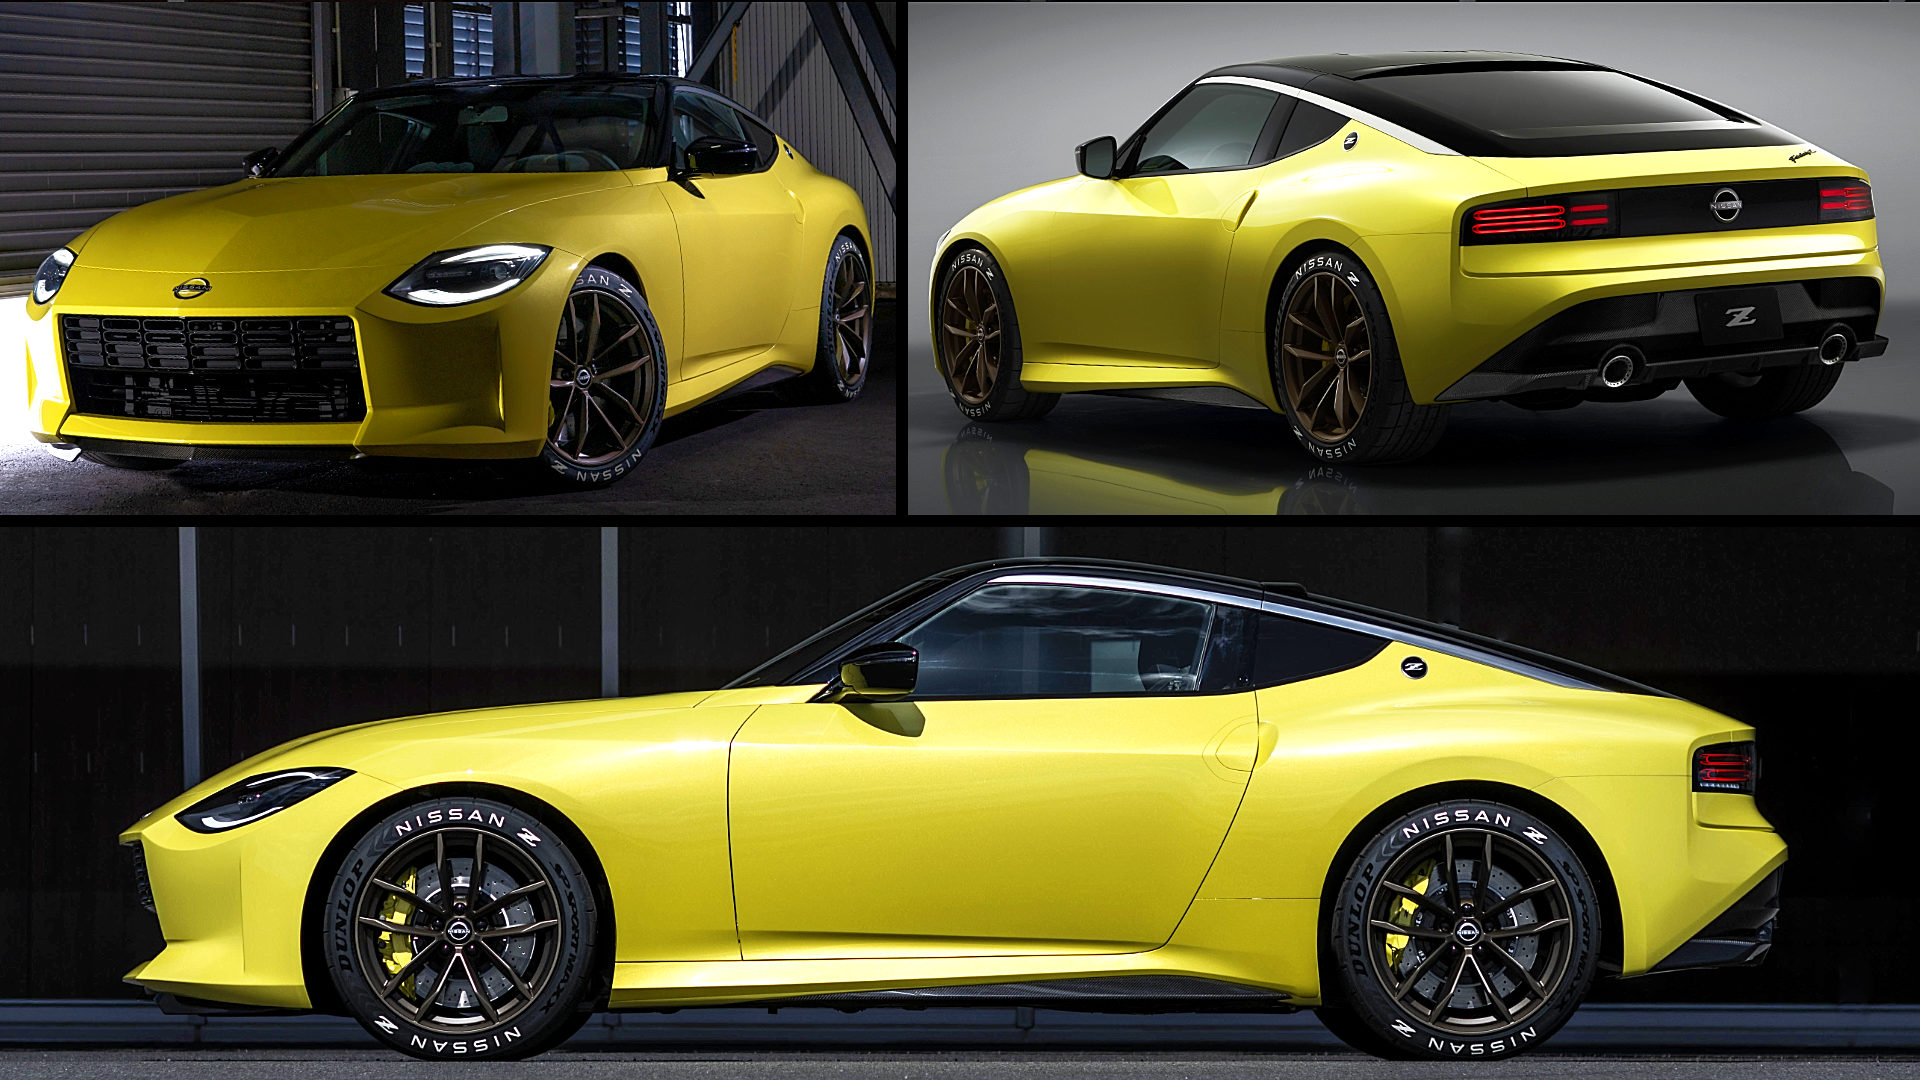 2021 Nissan Z Proto Sports Car Photos